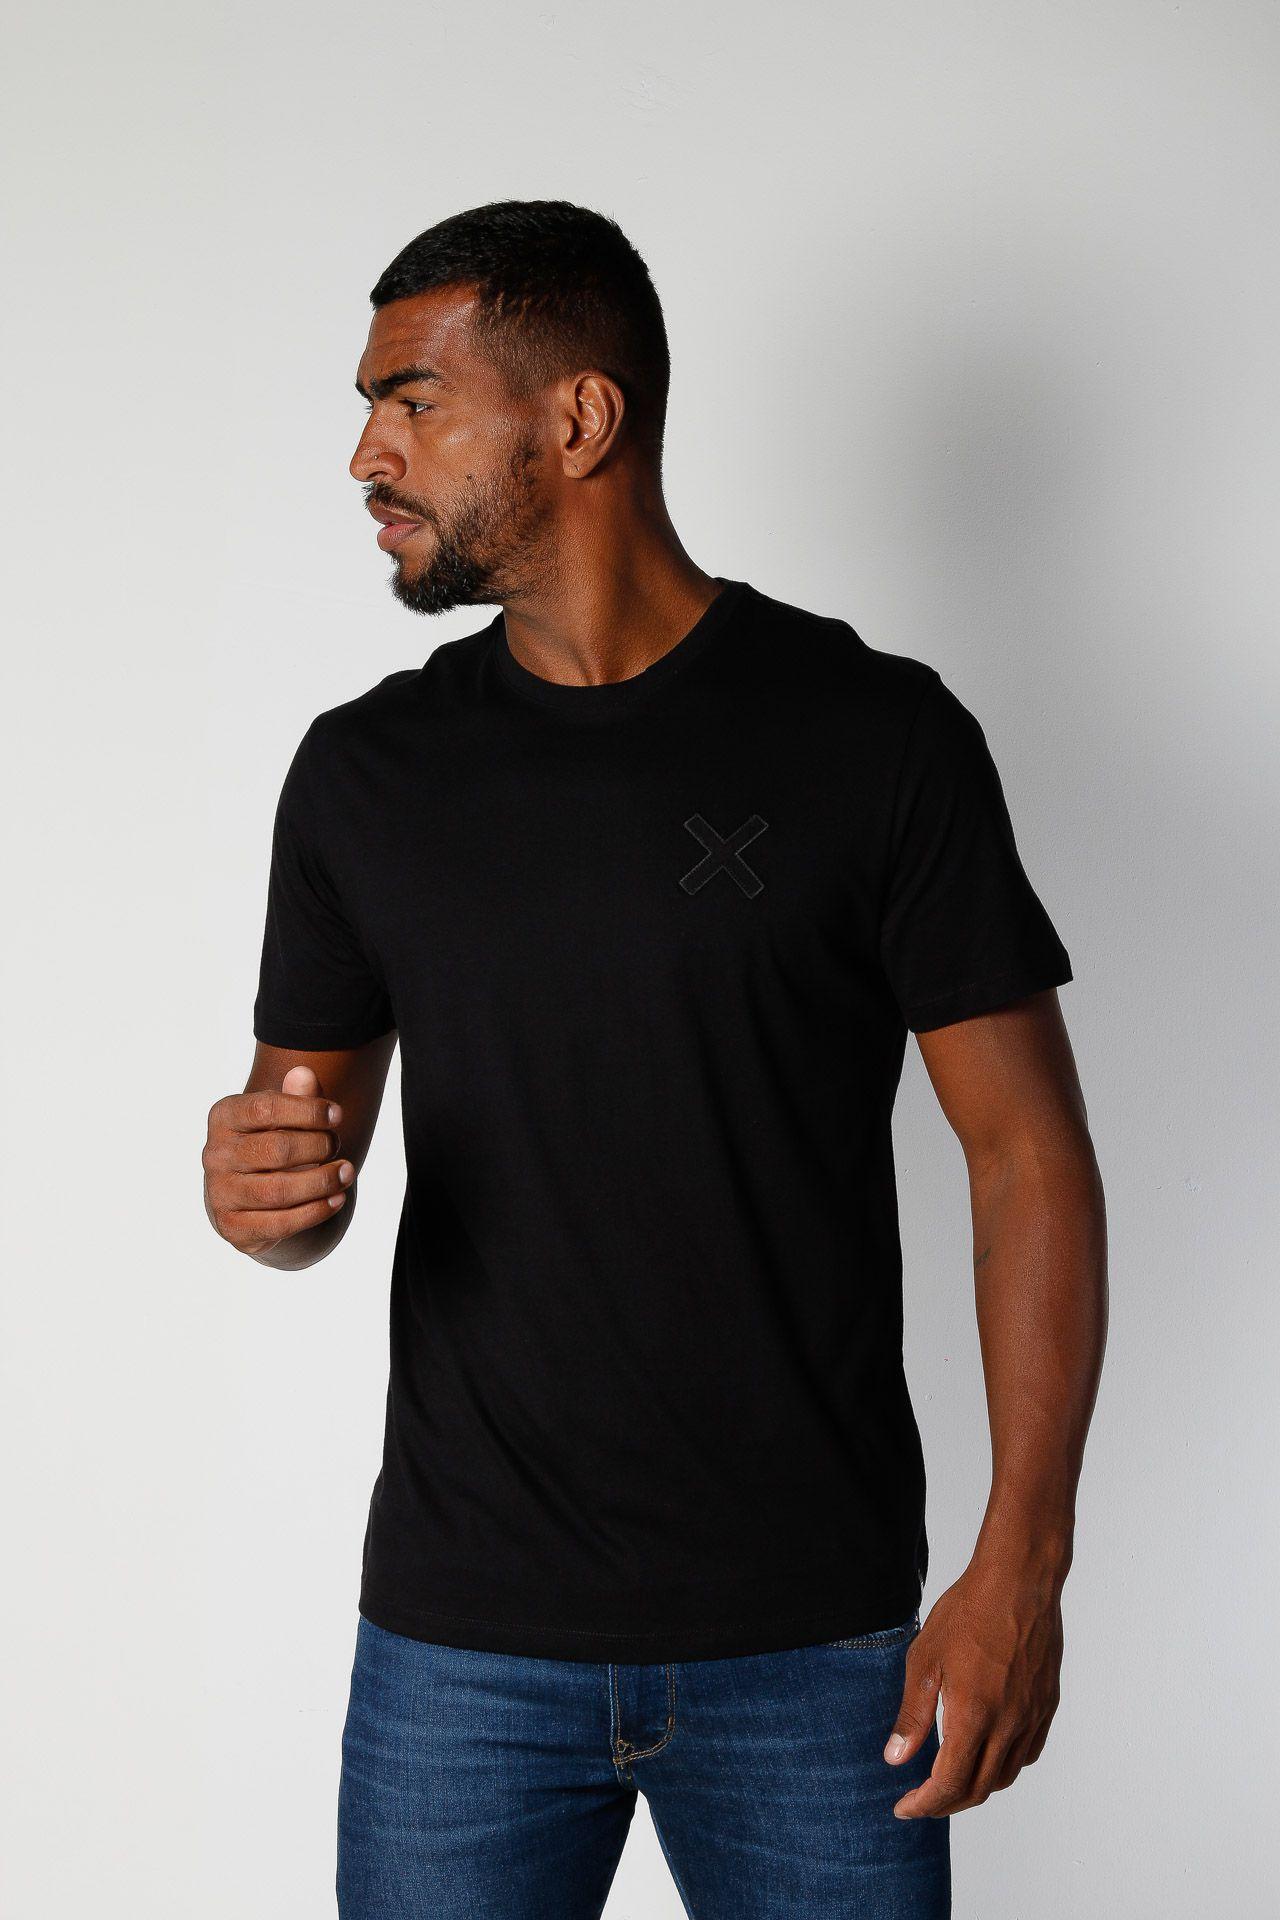 Camiseta Masculina TXC 2032